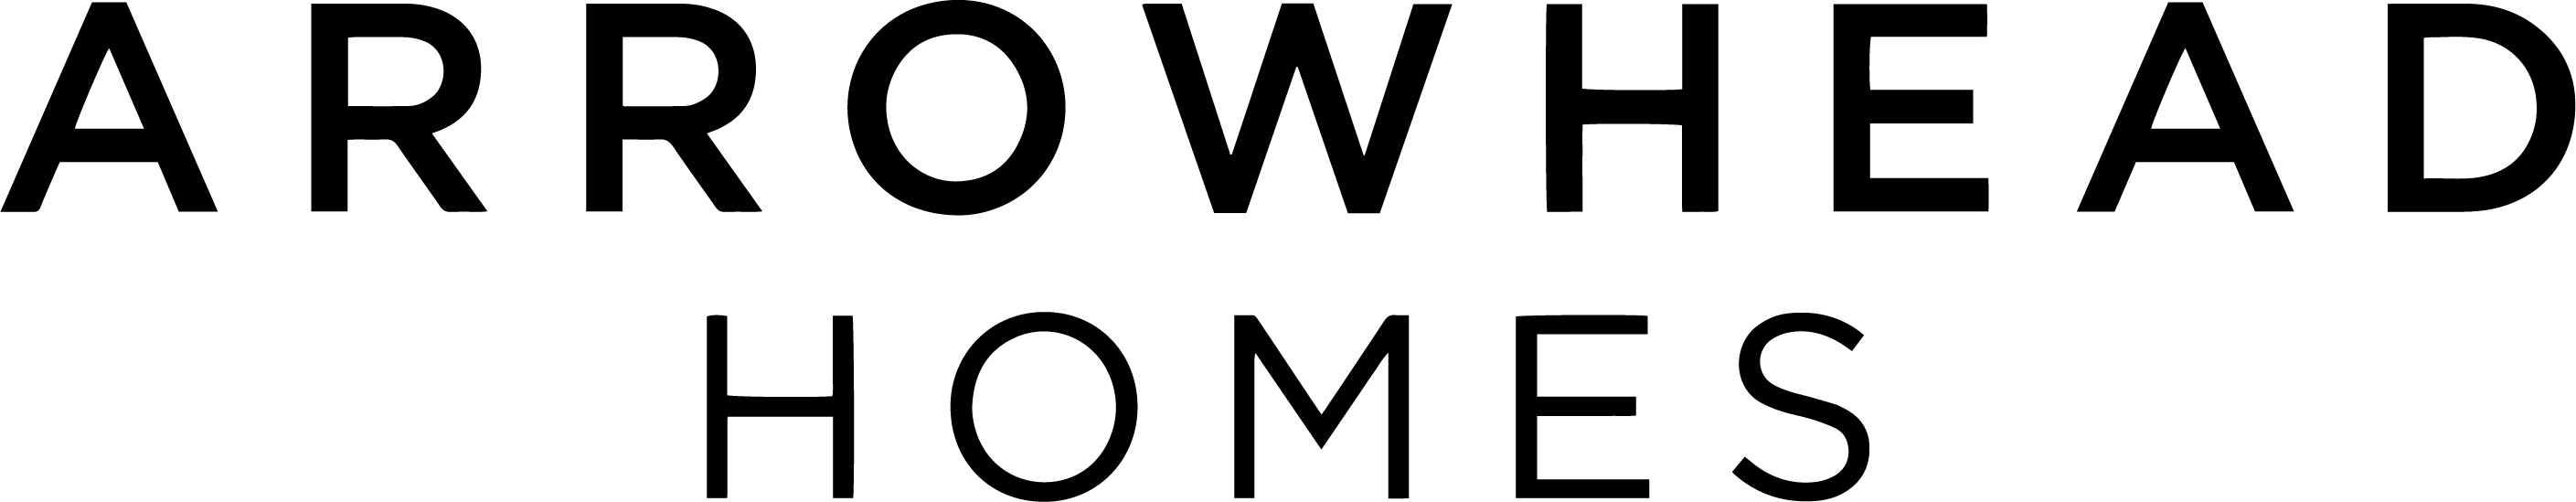 Arrowhead Homes